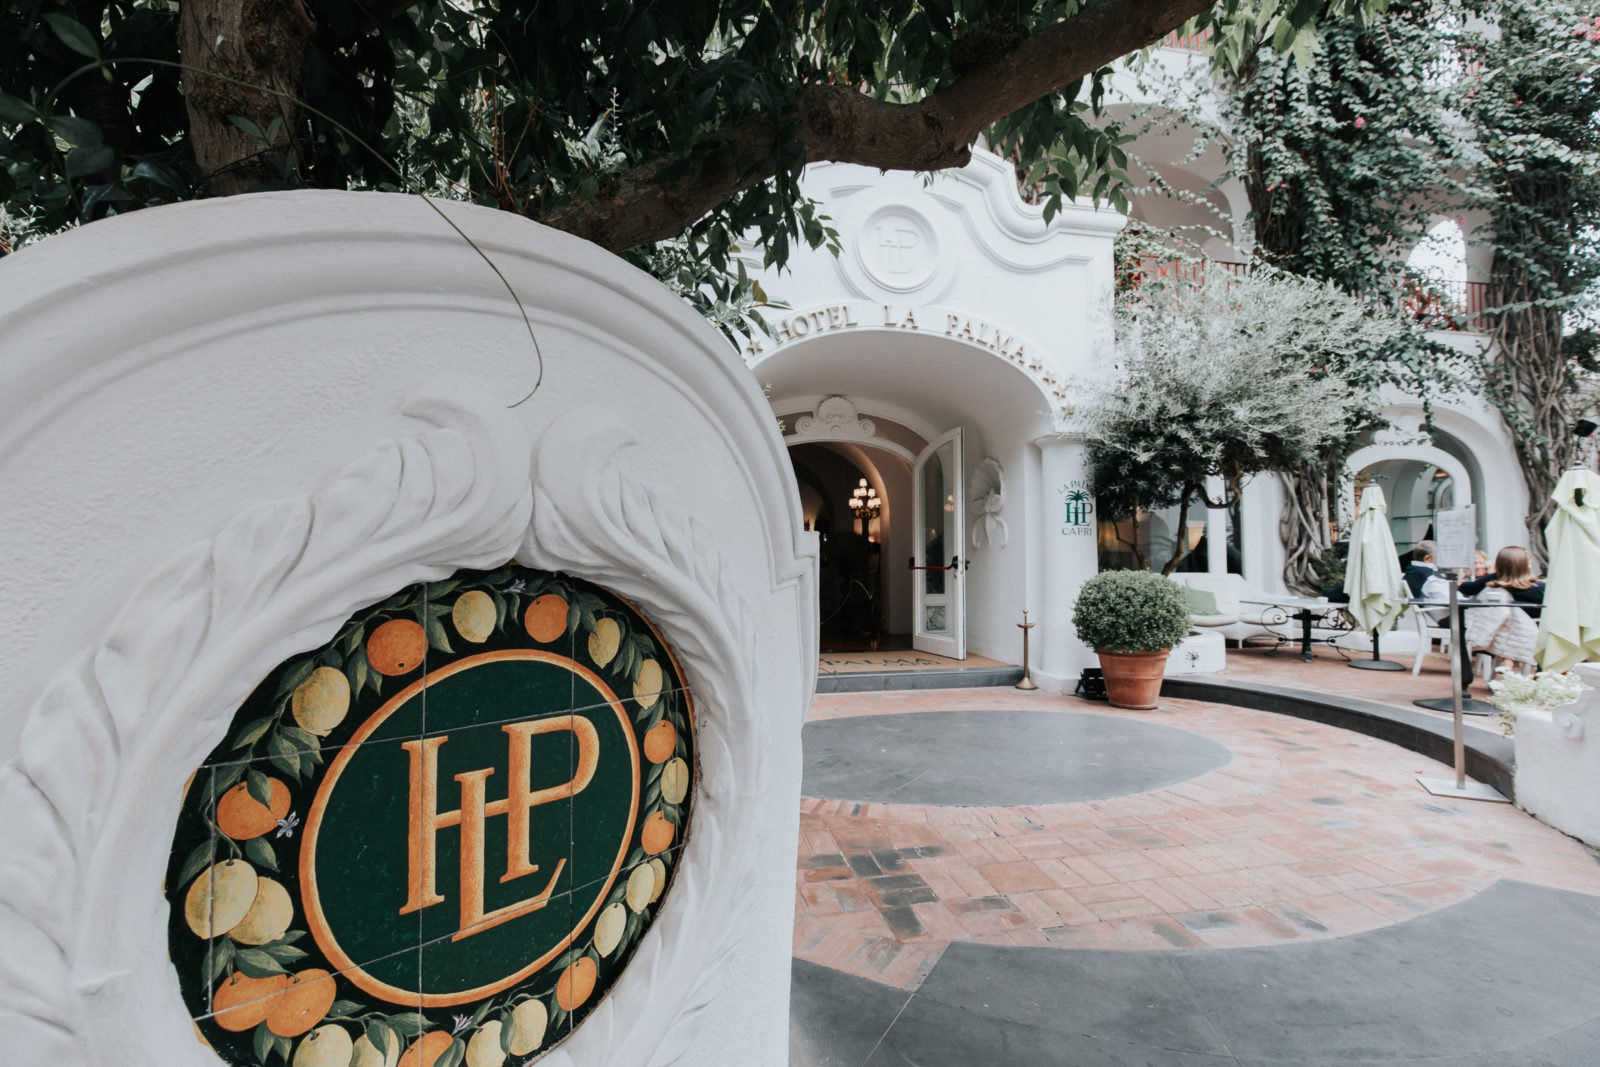 Capri Sehenswürdigkeiten Hotel La Palma Eingang